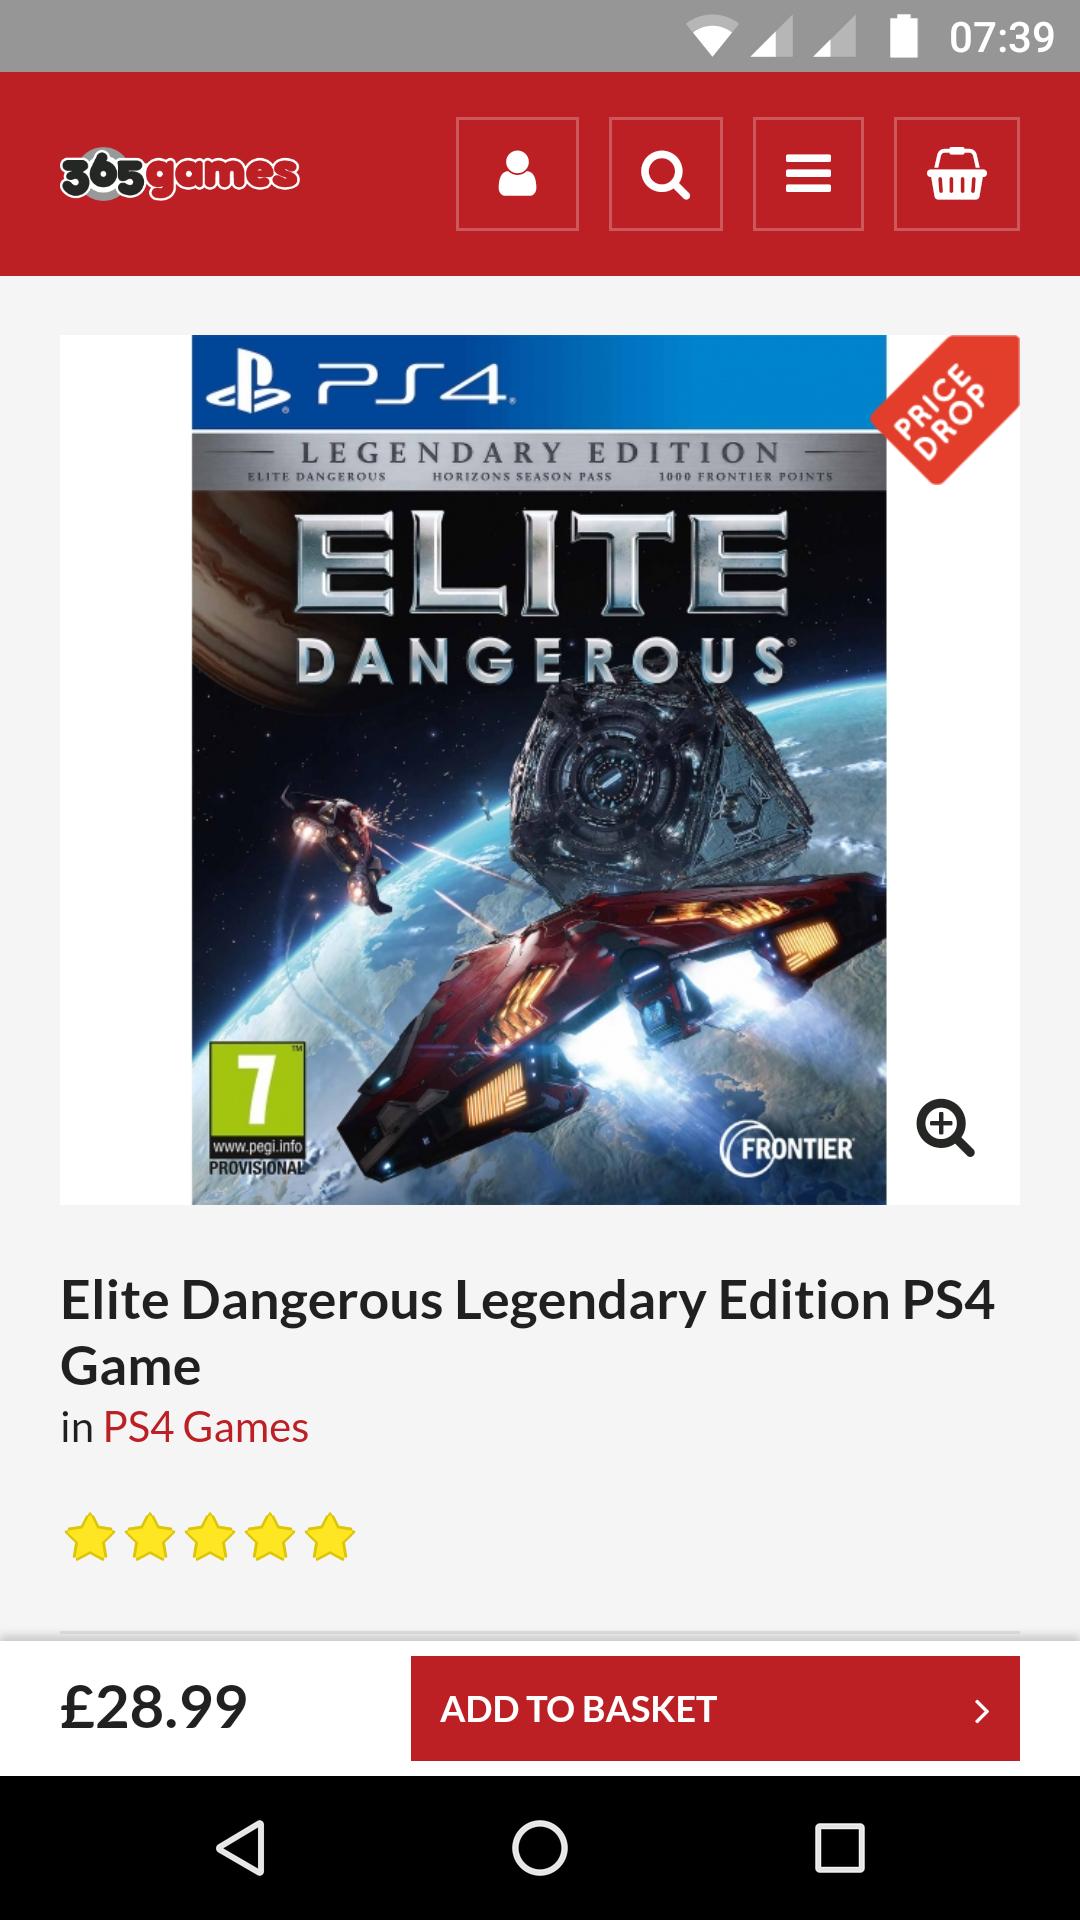 Elite Dangerous Legendary Edition PS4 £28.99 365games.co.uk